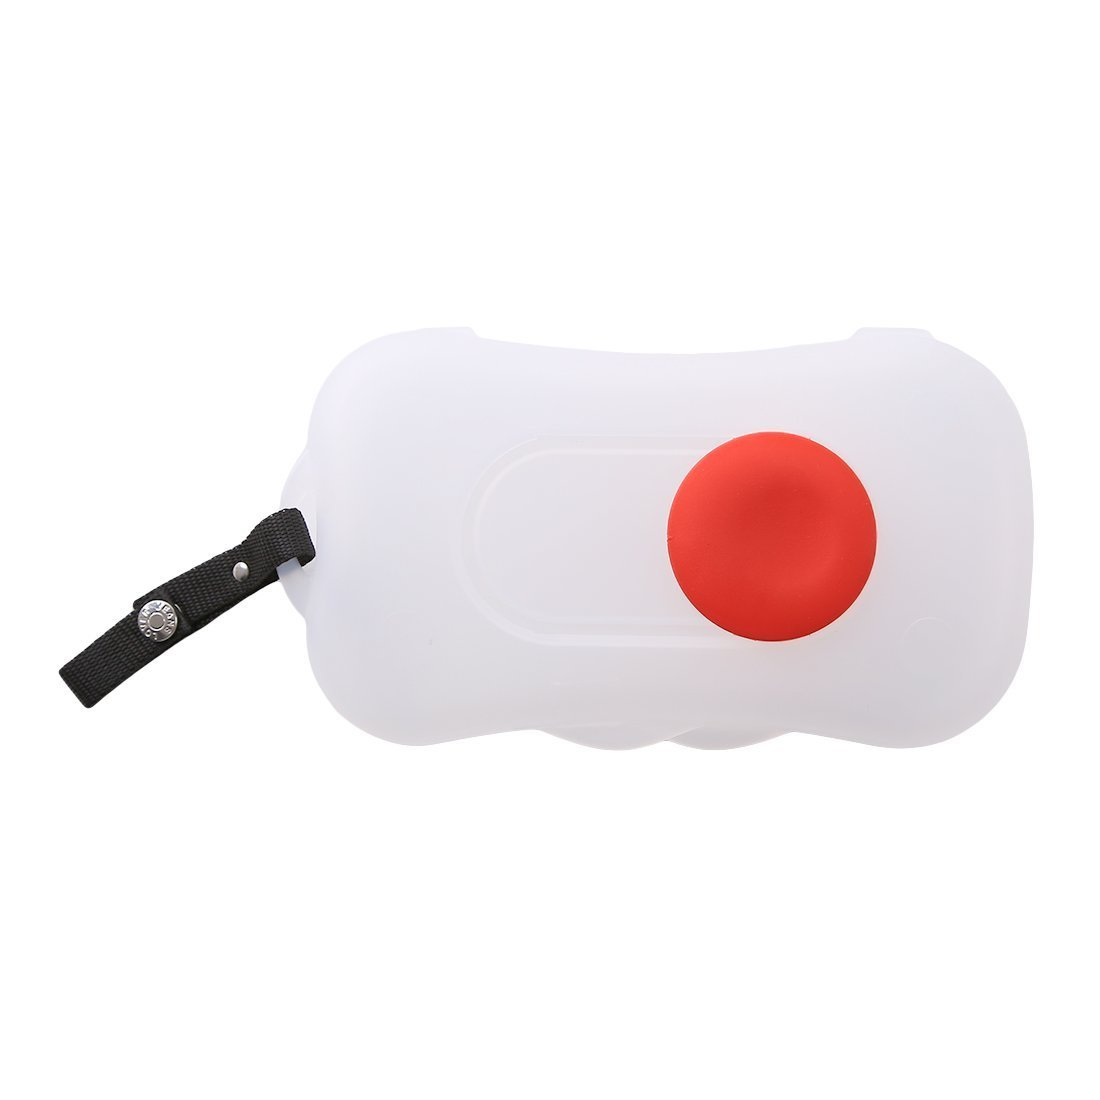 Portable Wet Tissue Case Travel Wipes Dispenser Wet Wipes Box for Baby Kid Toddler (White-Red) FAVOLOOK UK20180126007